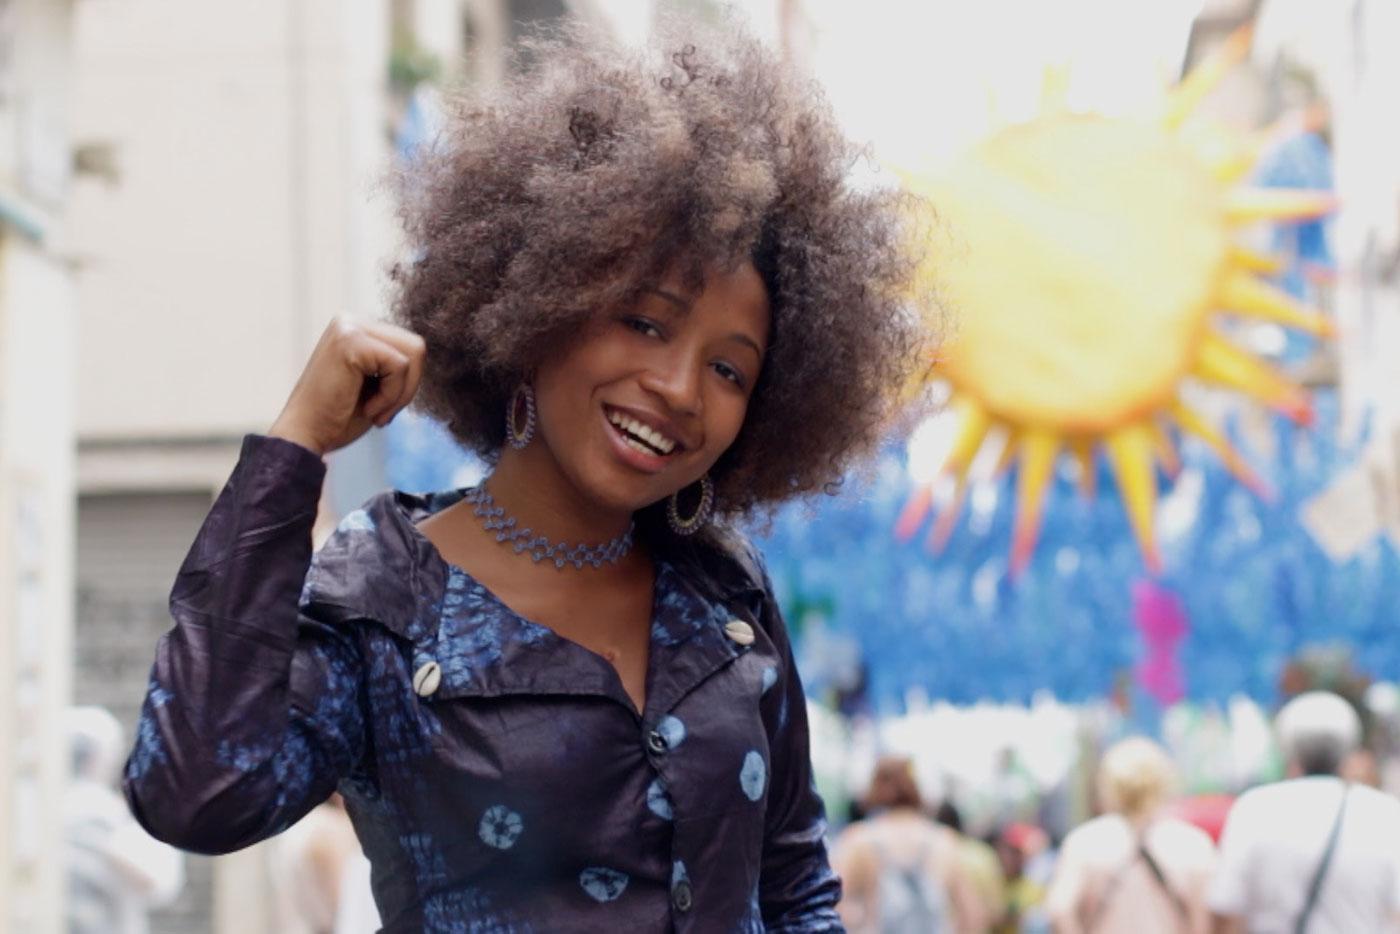 Alter Africa celebrará la música africana facturada en Barcelona